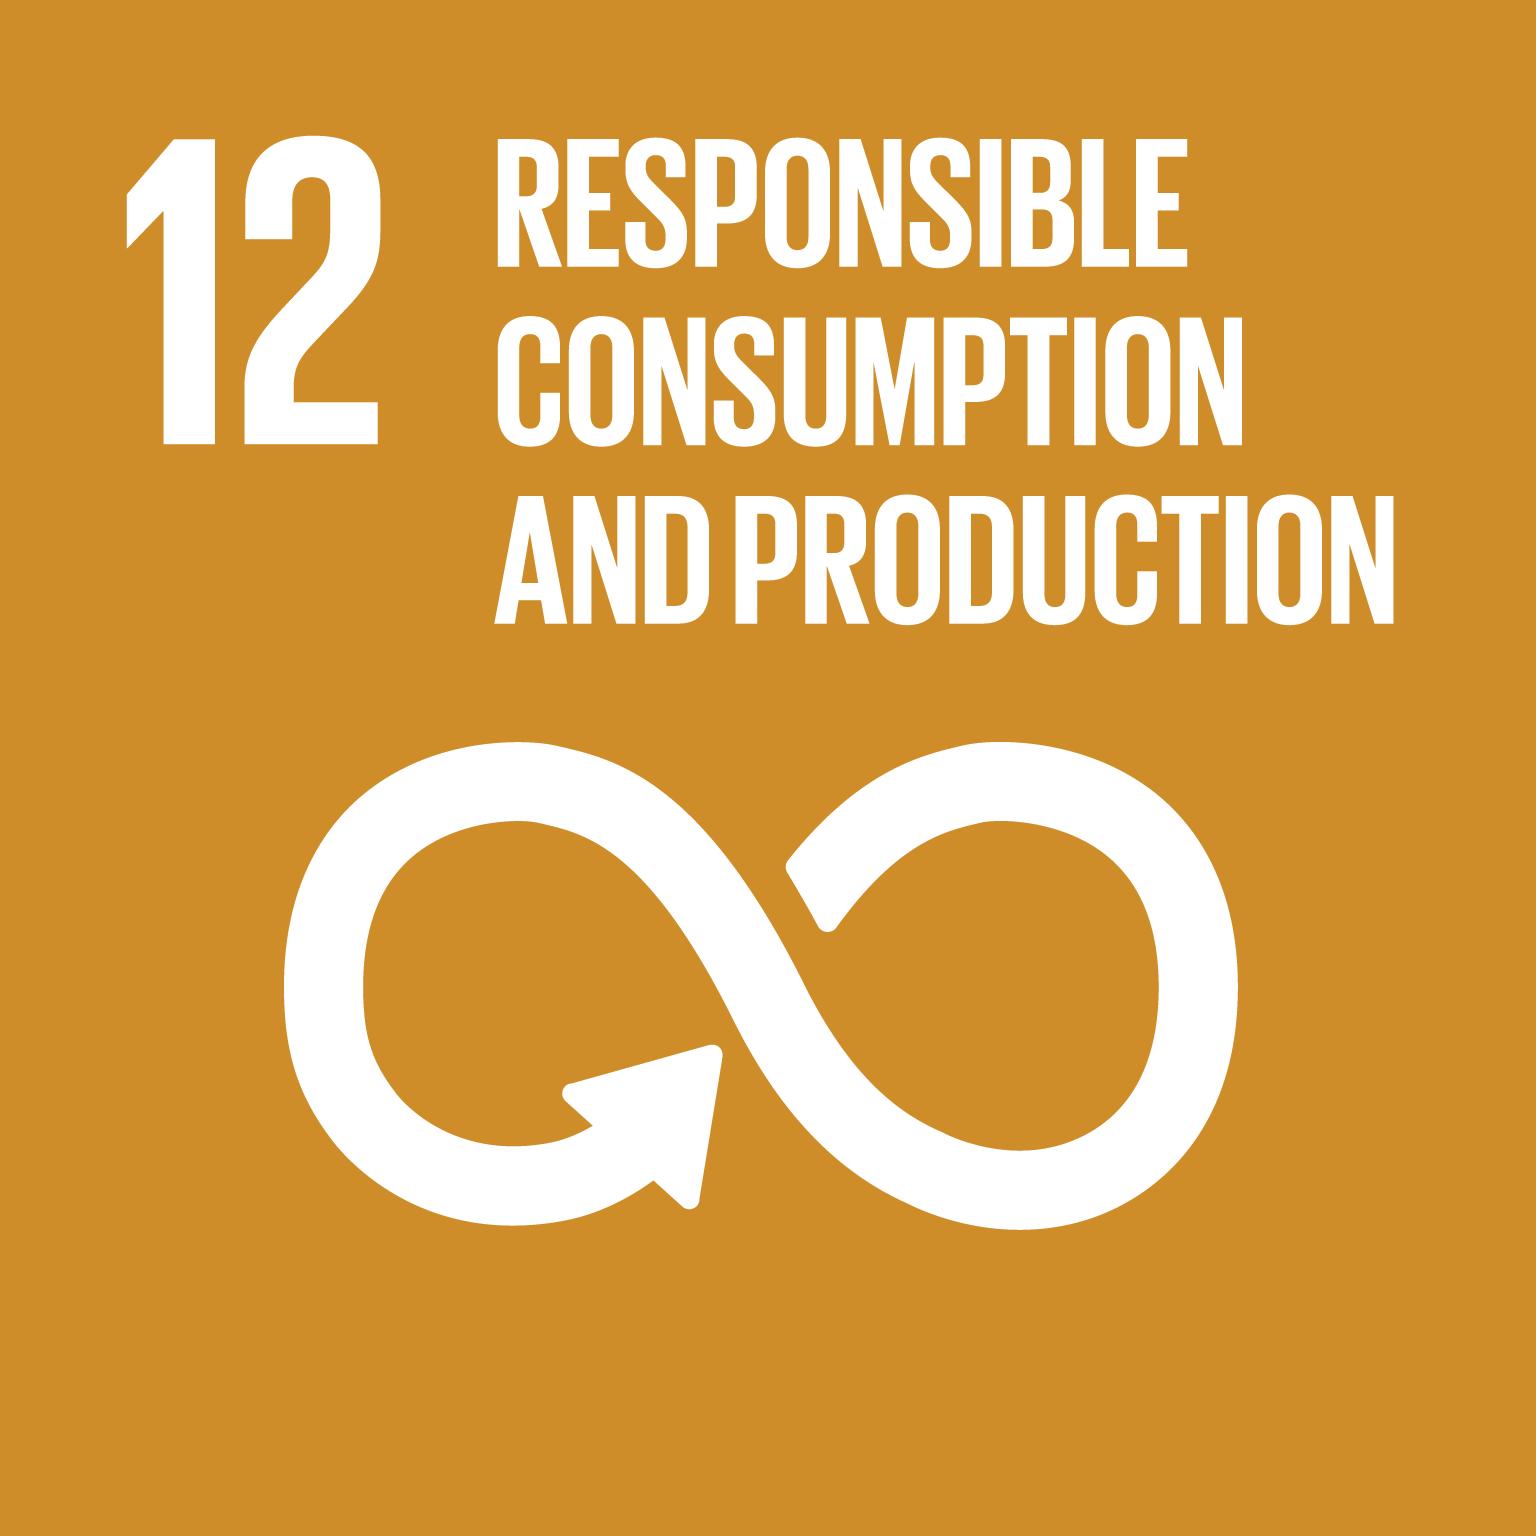 Goal 12: Responsible Consumption